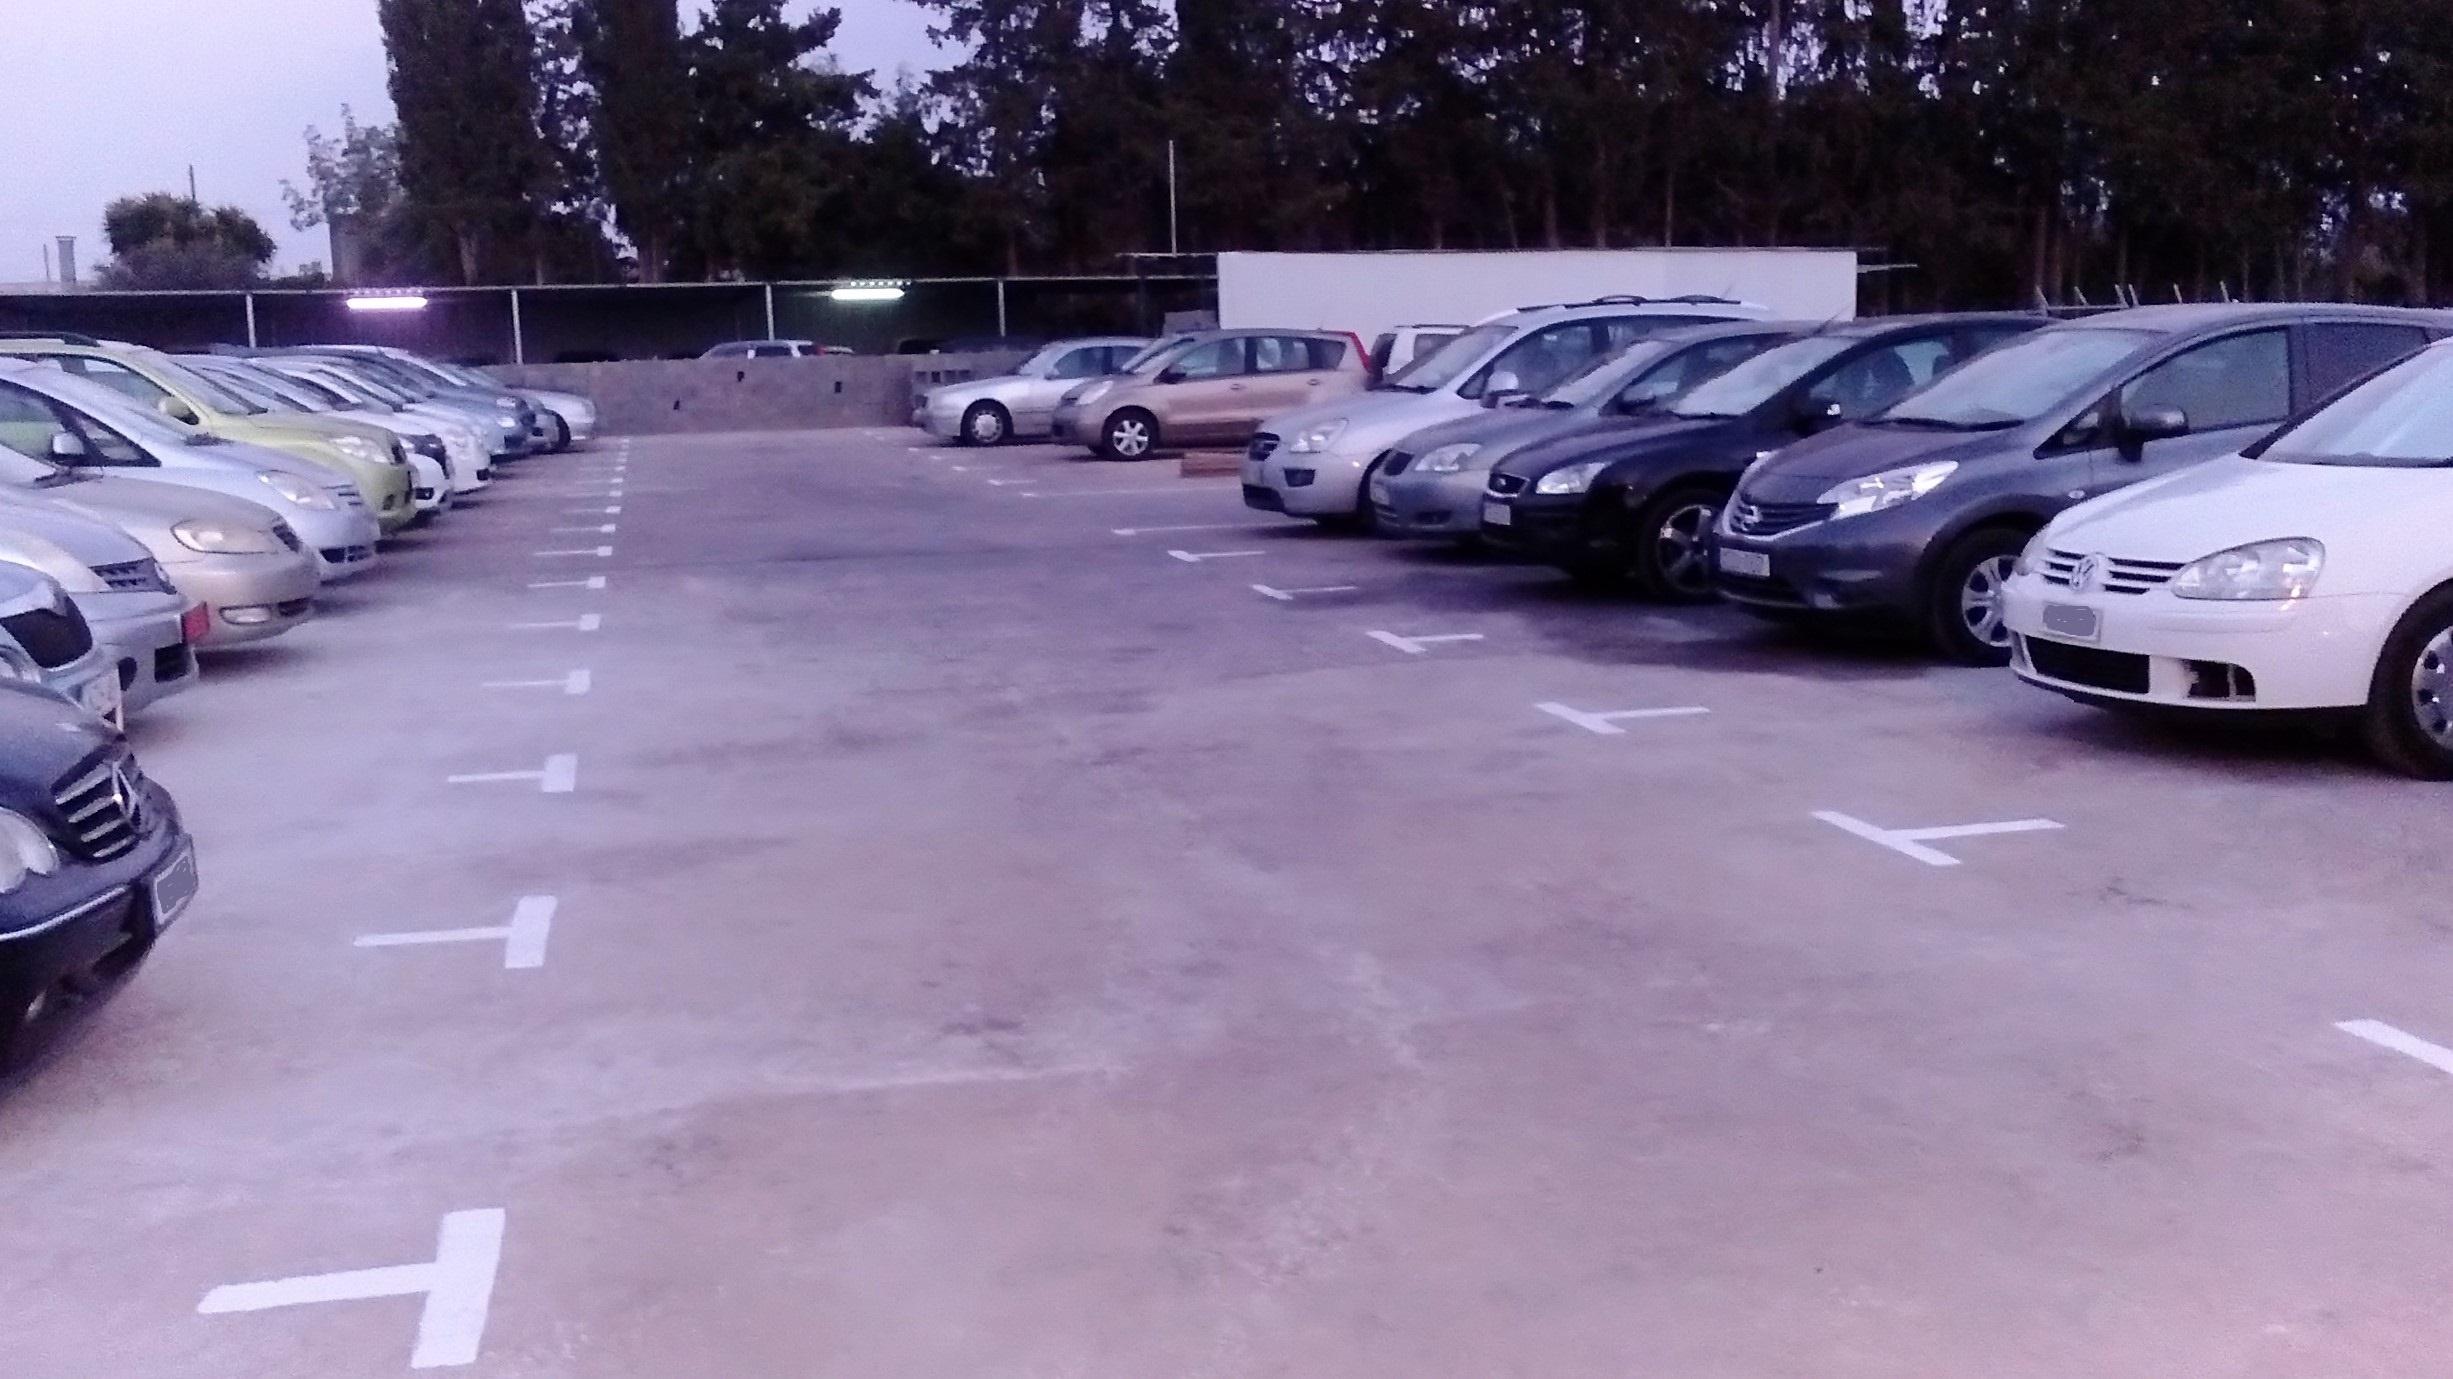 https://direct.parkcloud.com/images/operator/00000000-0000-0000-0000-000000000000/18876